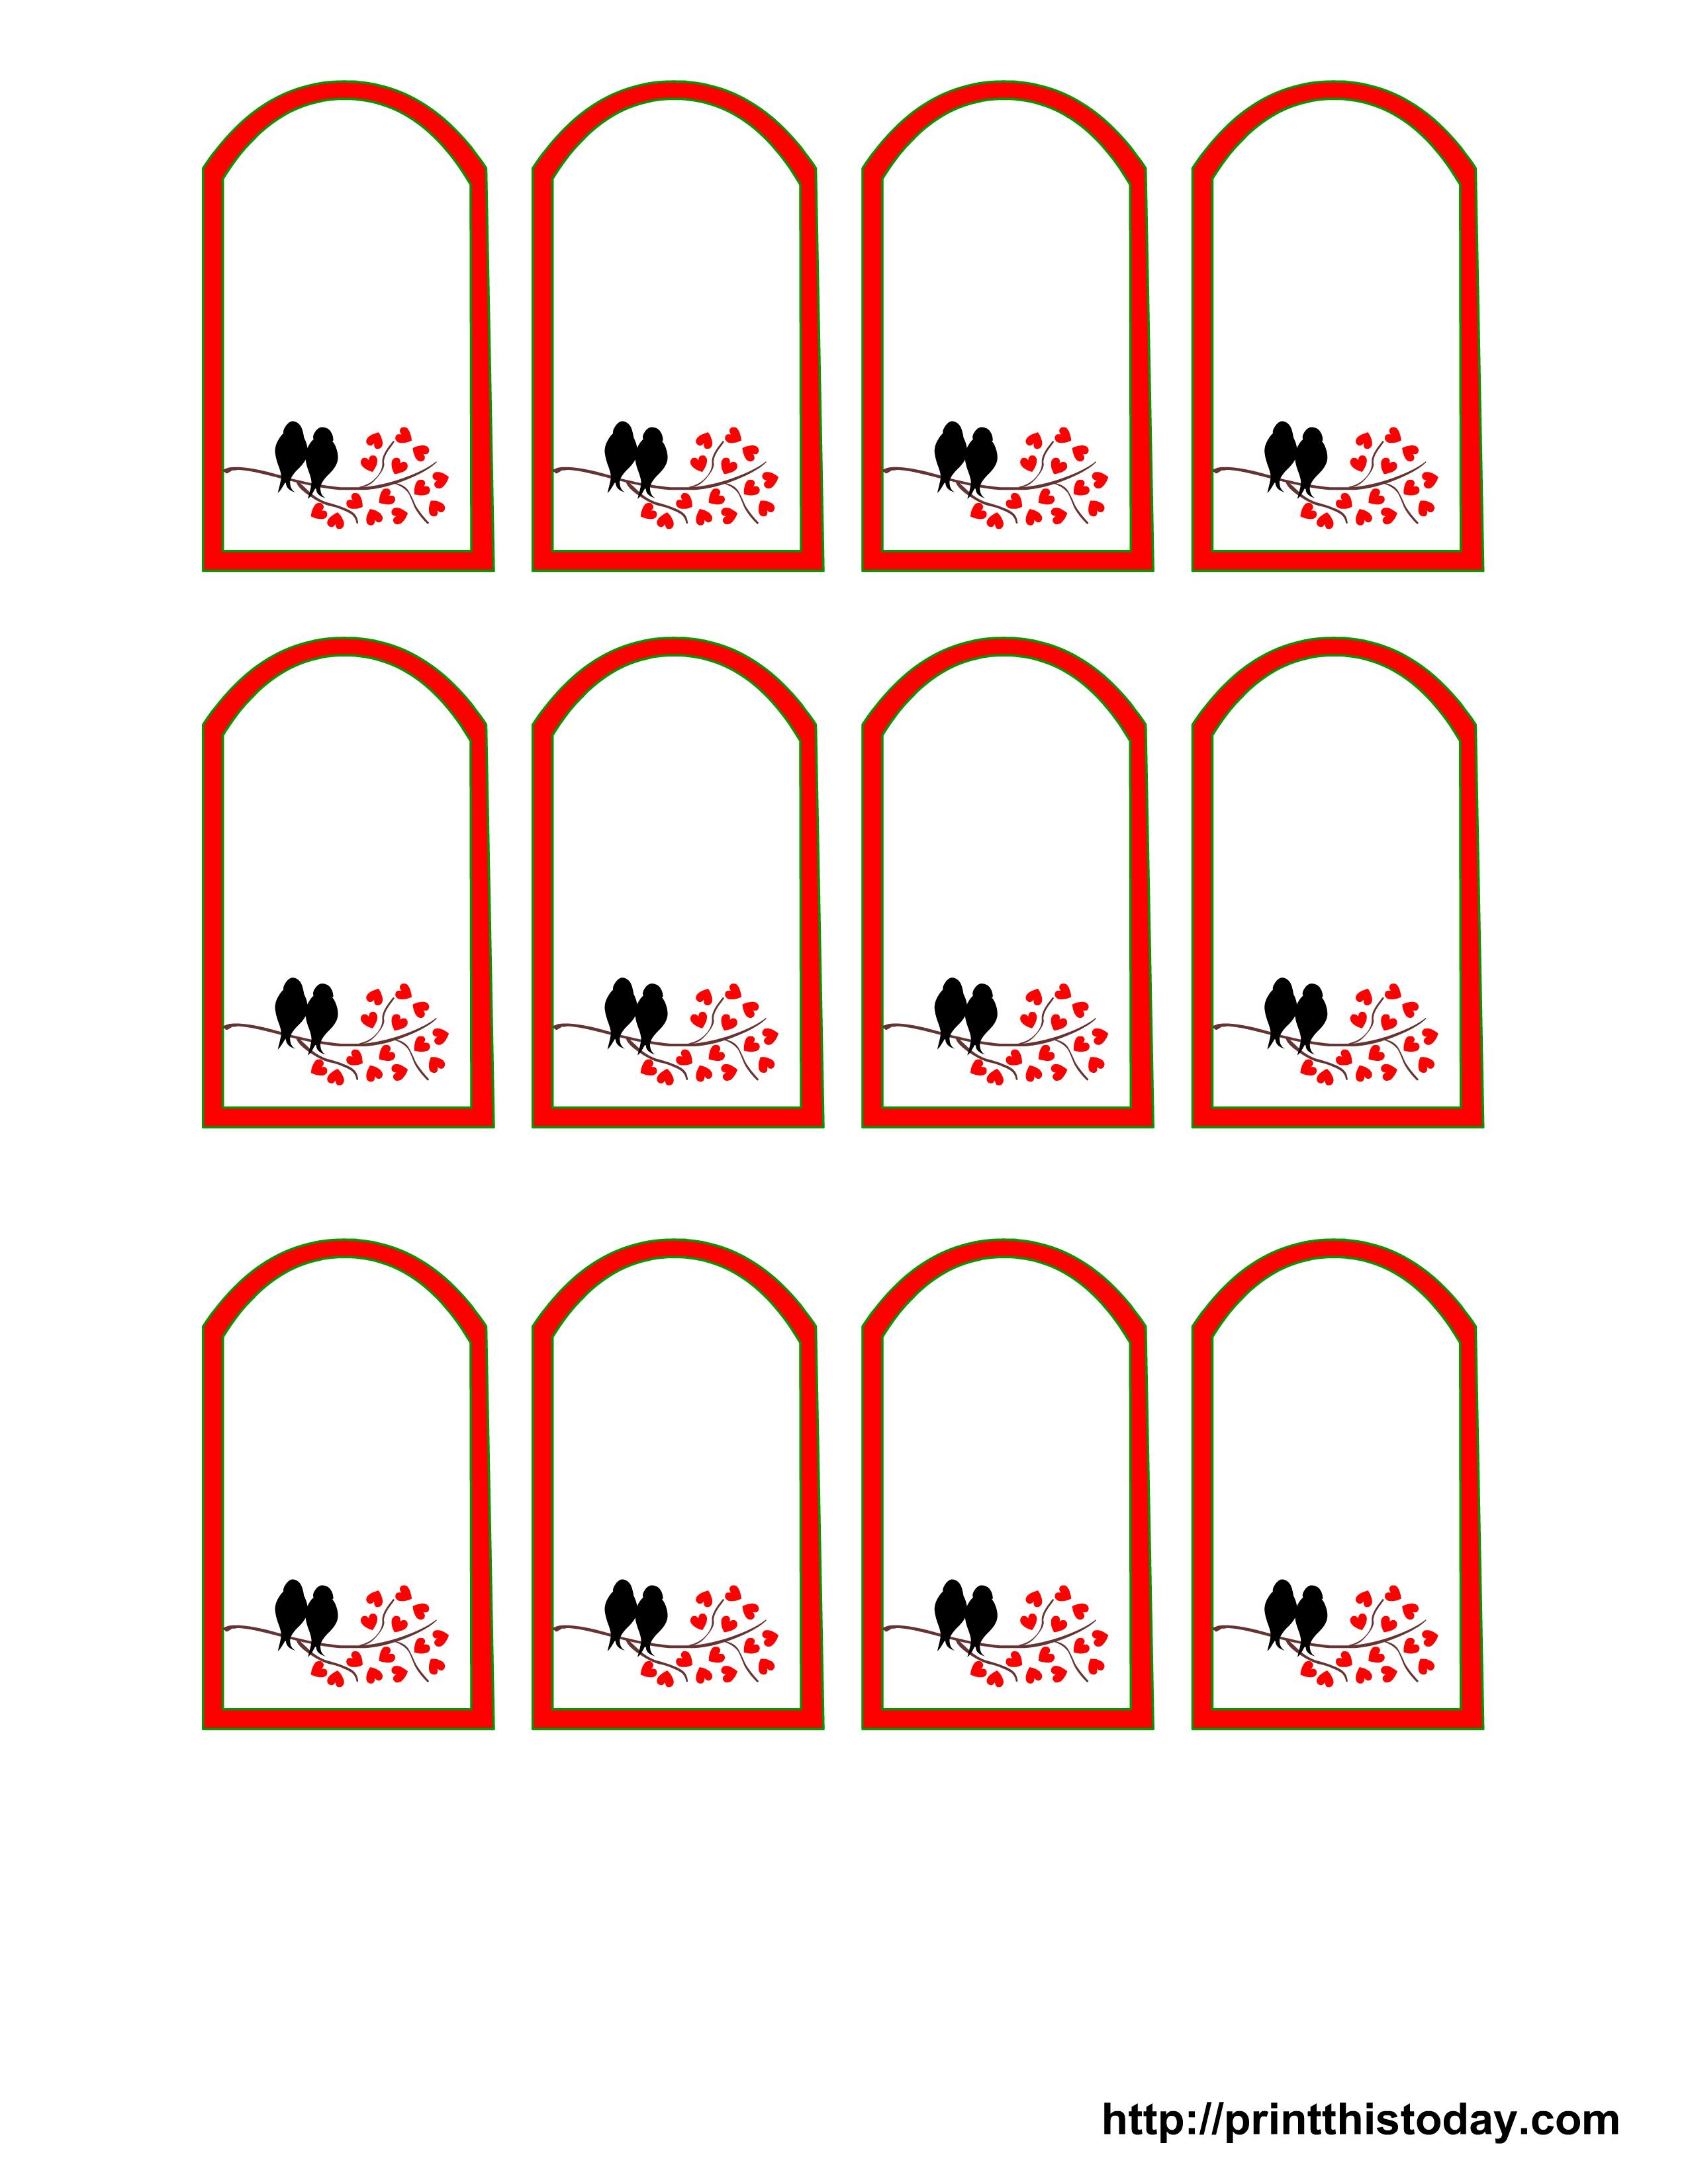 Free Printable Wedding Favor Tags - Free Printable Wedding Favor Tags